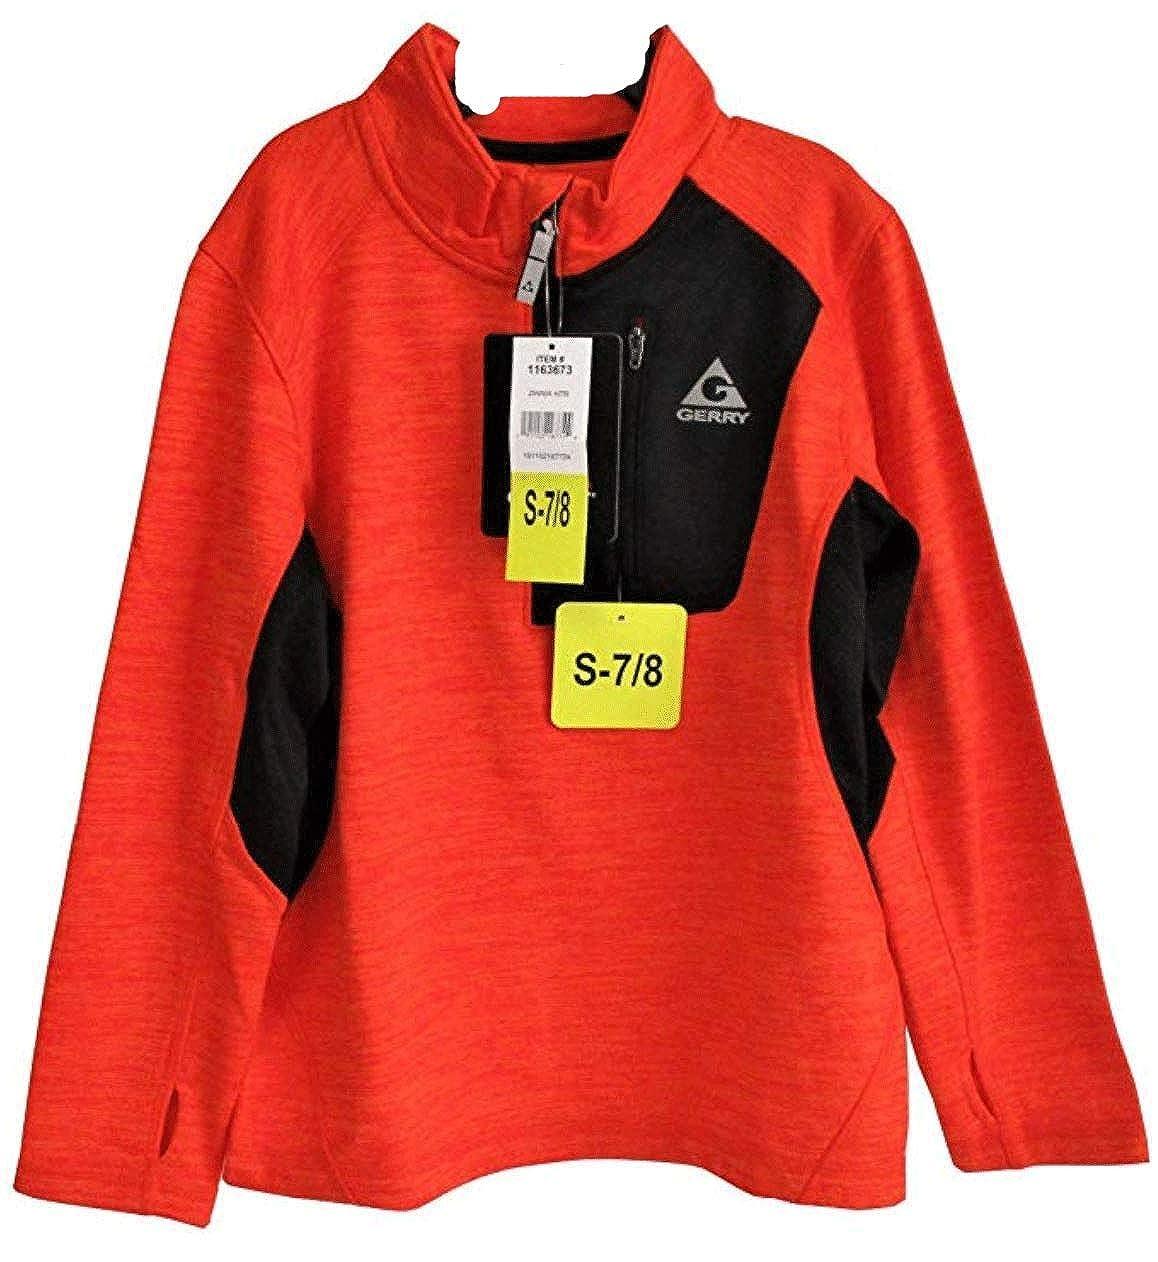 Gerry Kids Youth Boys Quarter Zip Lightweight Athletic Fleece Lined Sweatshirt Jacket Small 7//8